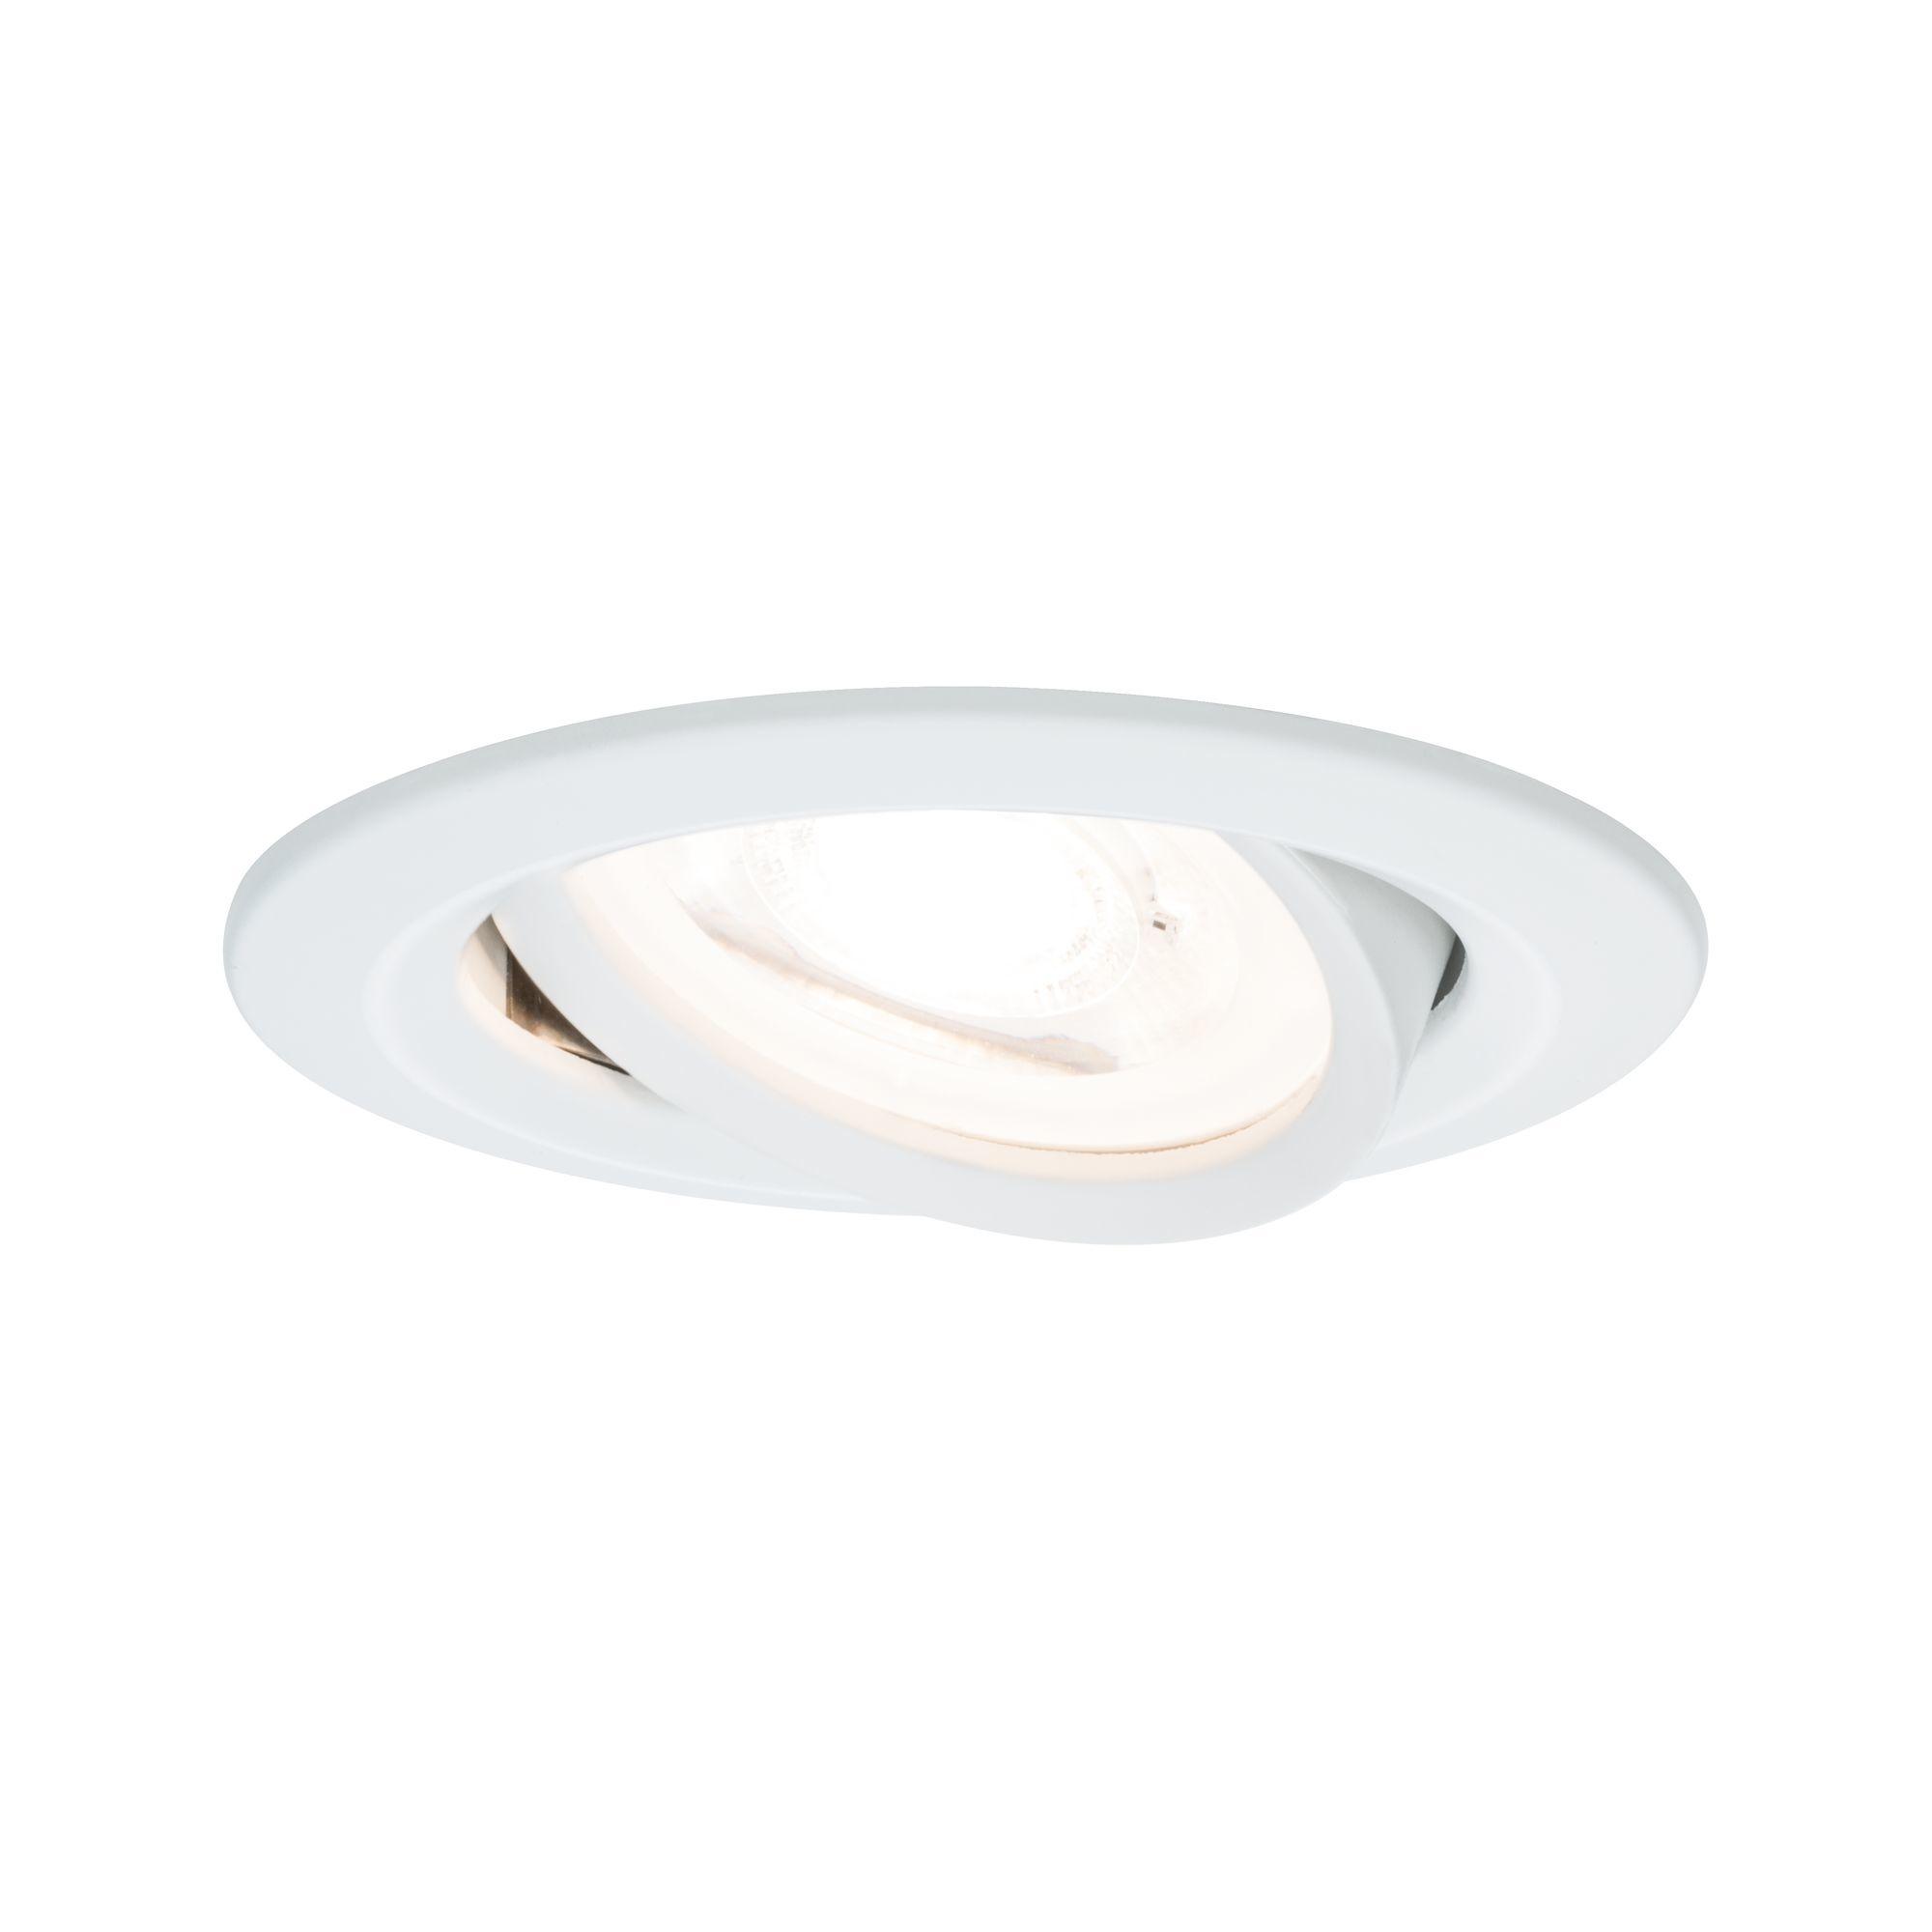 Paulmann EBL Set Nova rd schw LED 3stepdim 1x6,5W230V GU10 51mm Weiß matt/Alu